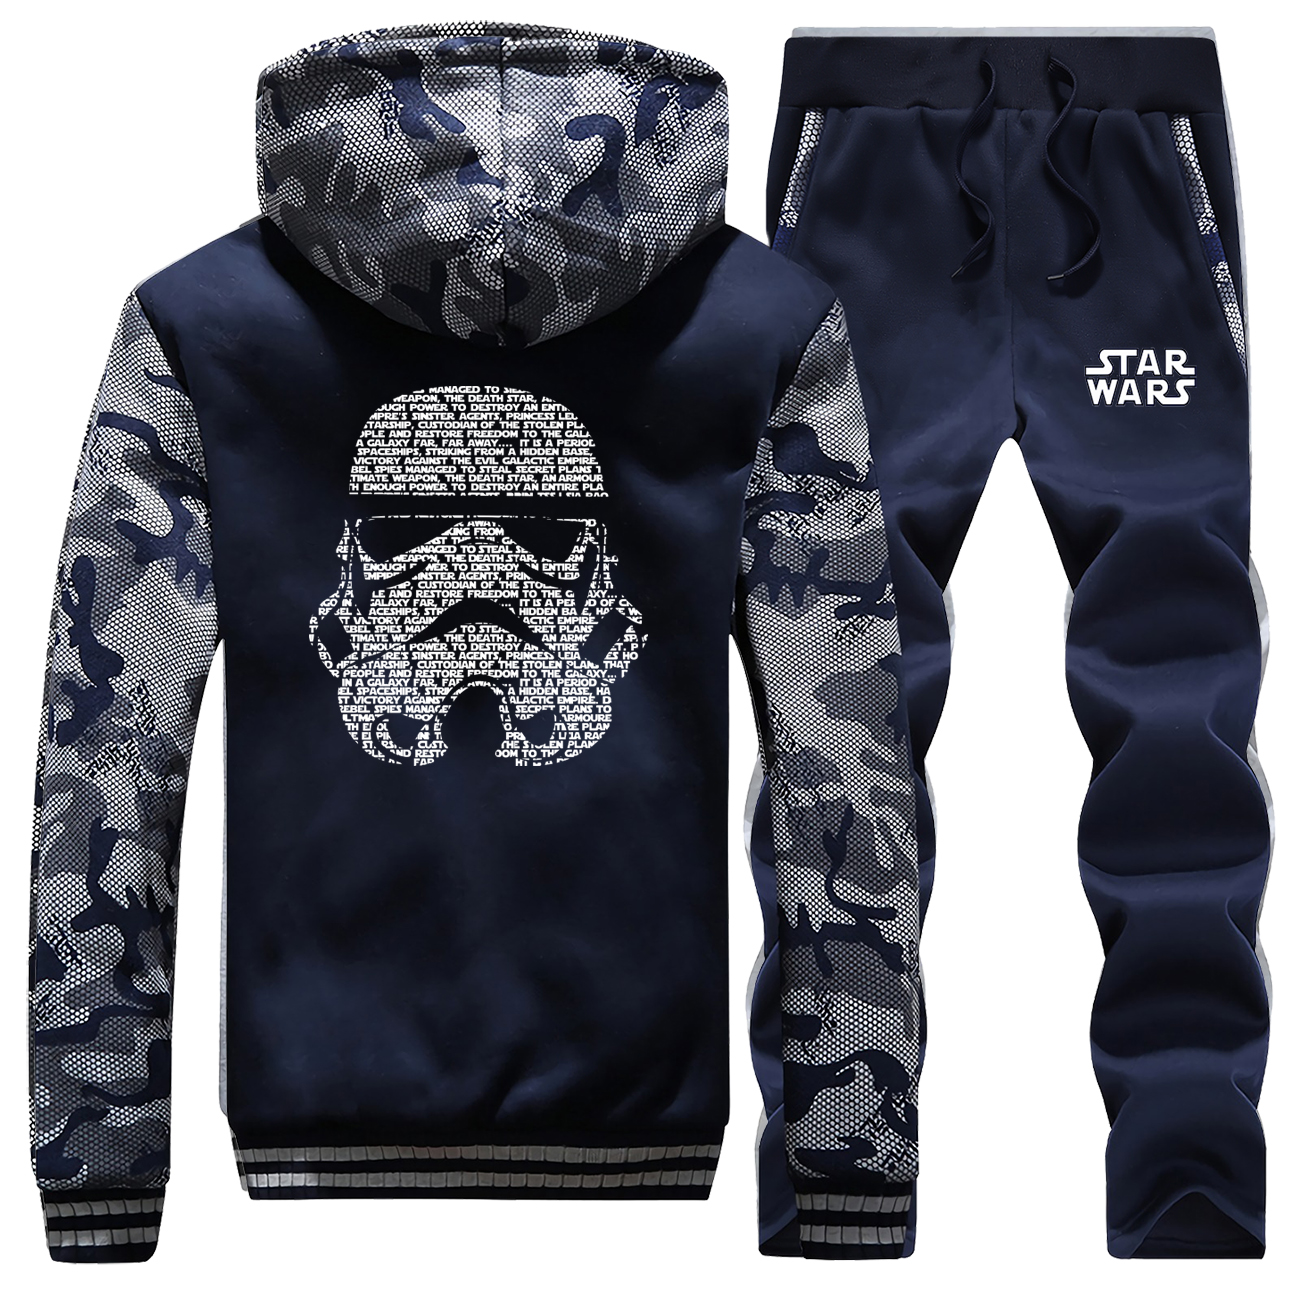 2019 Hot Sale Winter Hoodies Men Coat Thick Star Wars Stormtrooper Camouflage Suit Fleece Jacket Sportswear+Pants 2 Piece Set